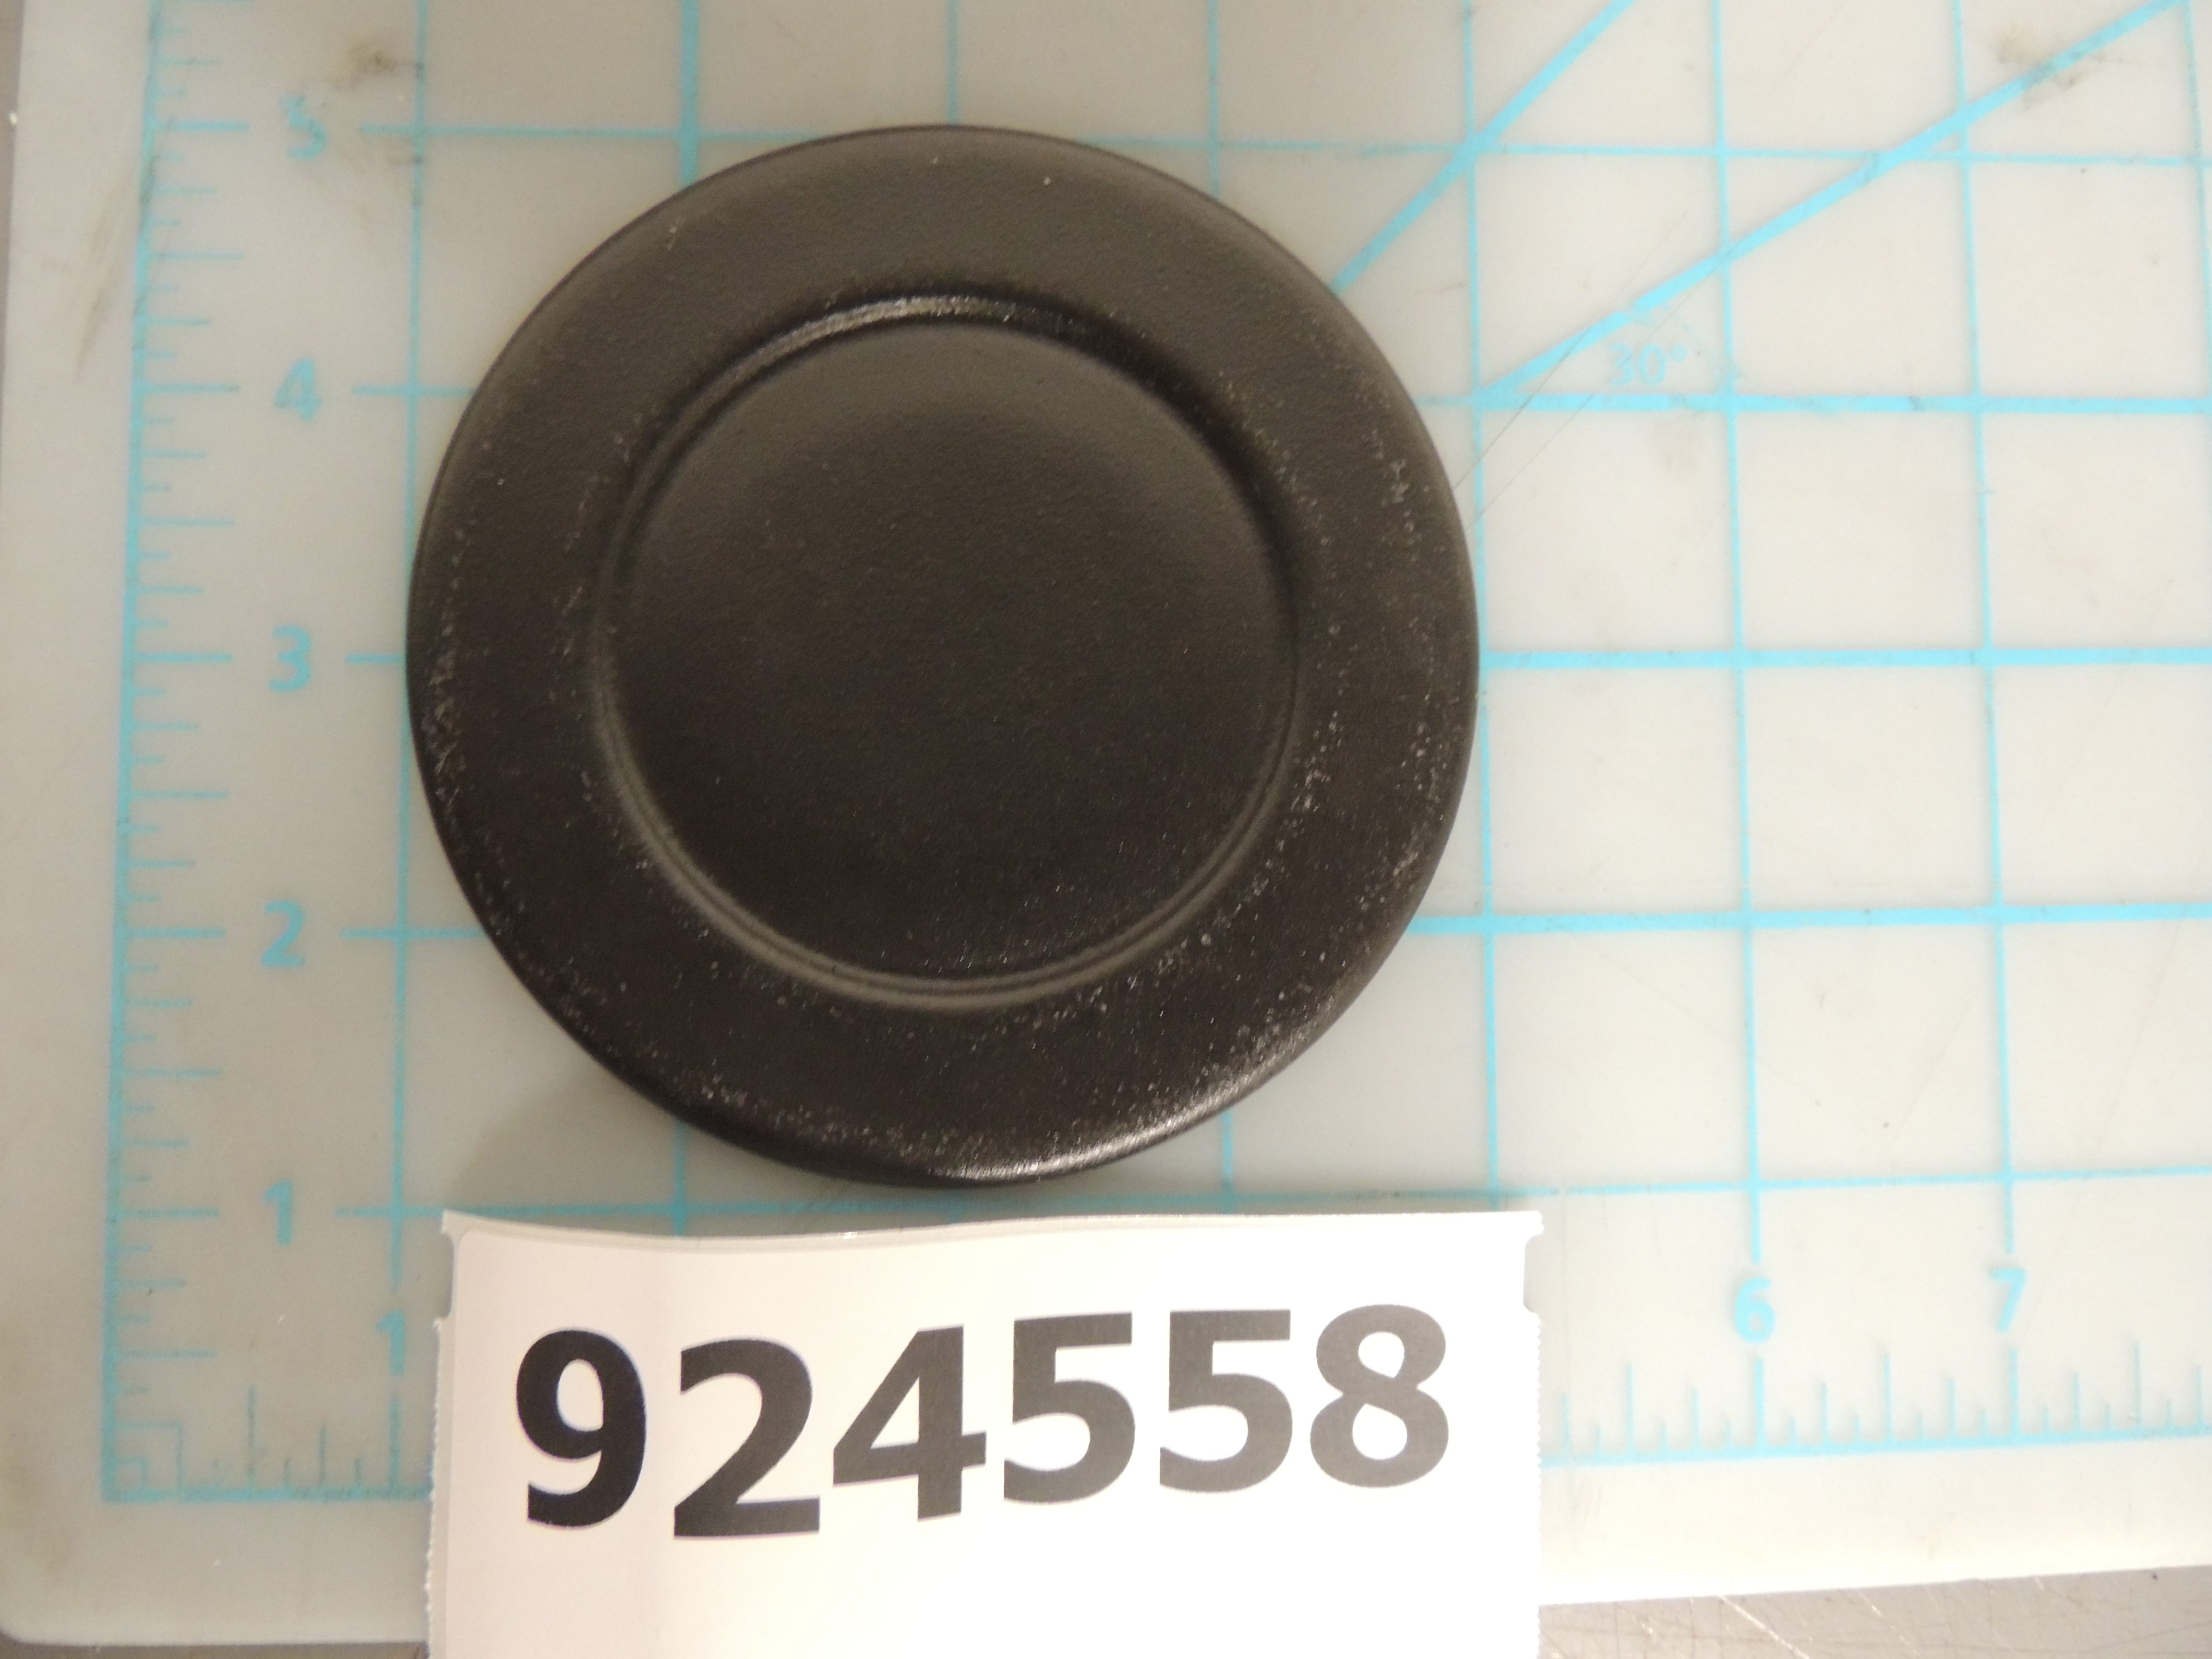 DGR DULL BURNER CAP 2mm (R)